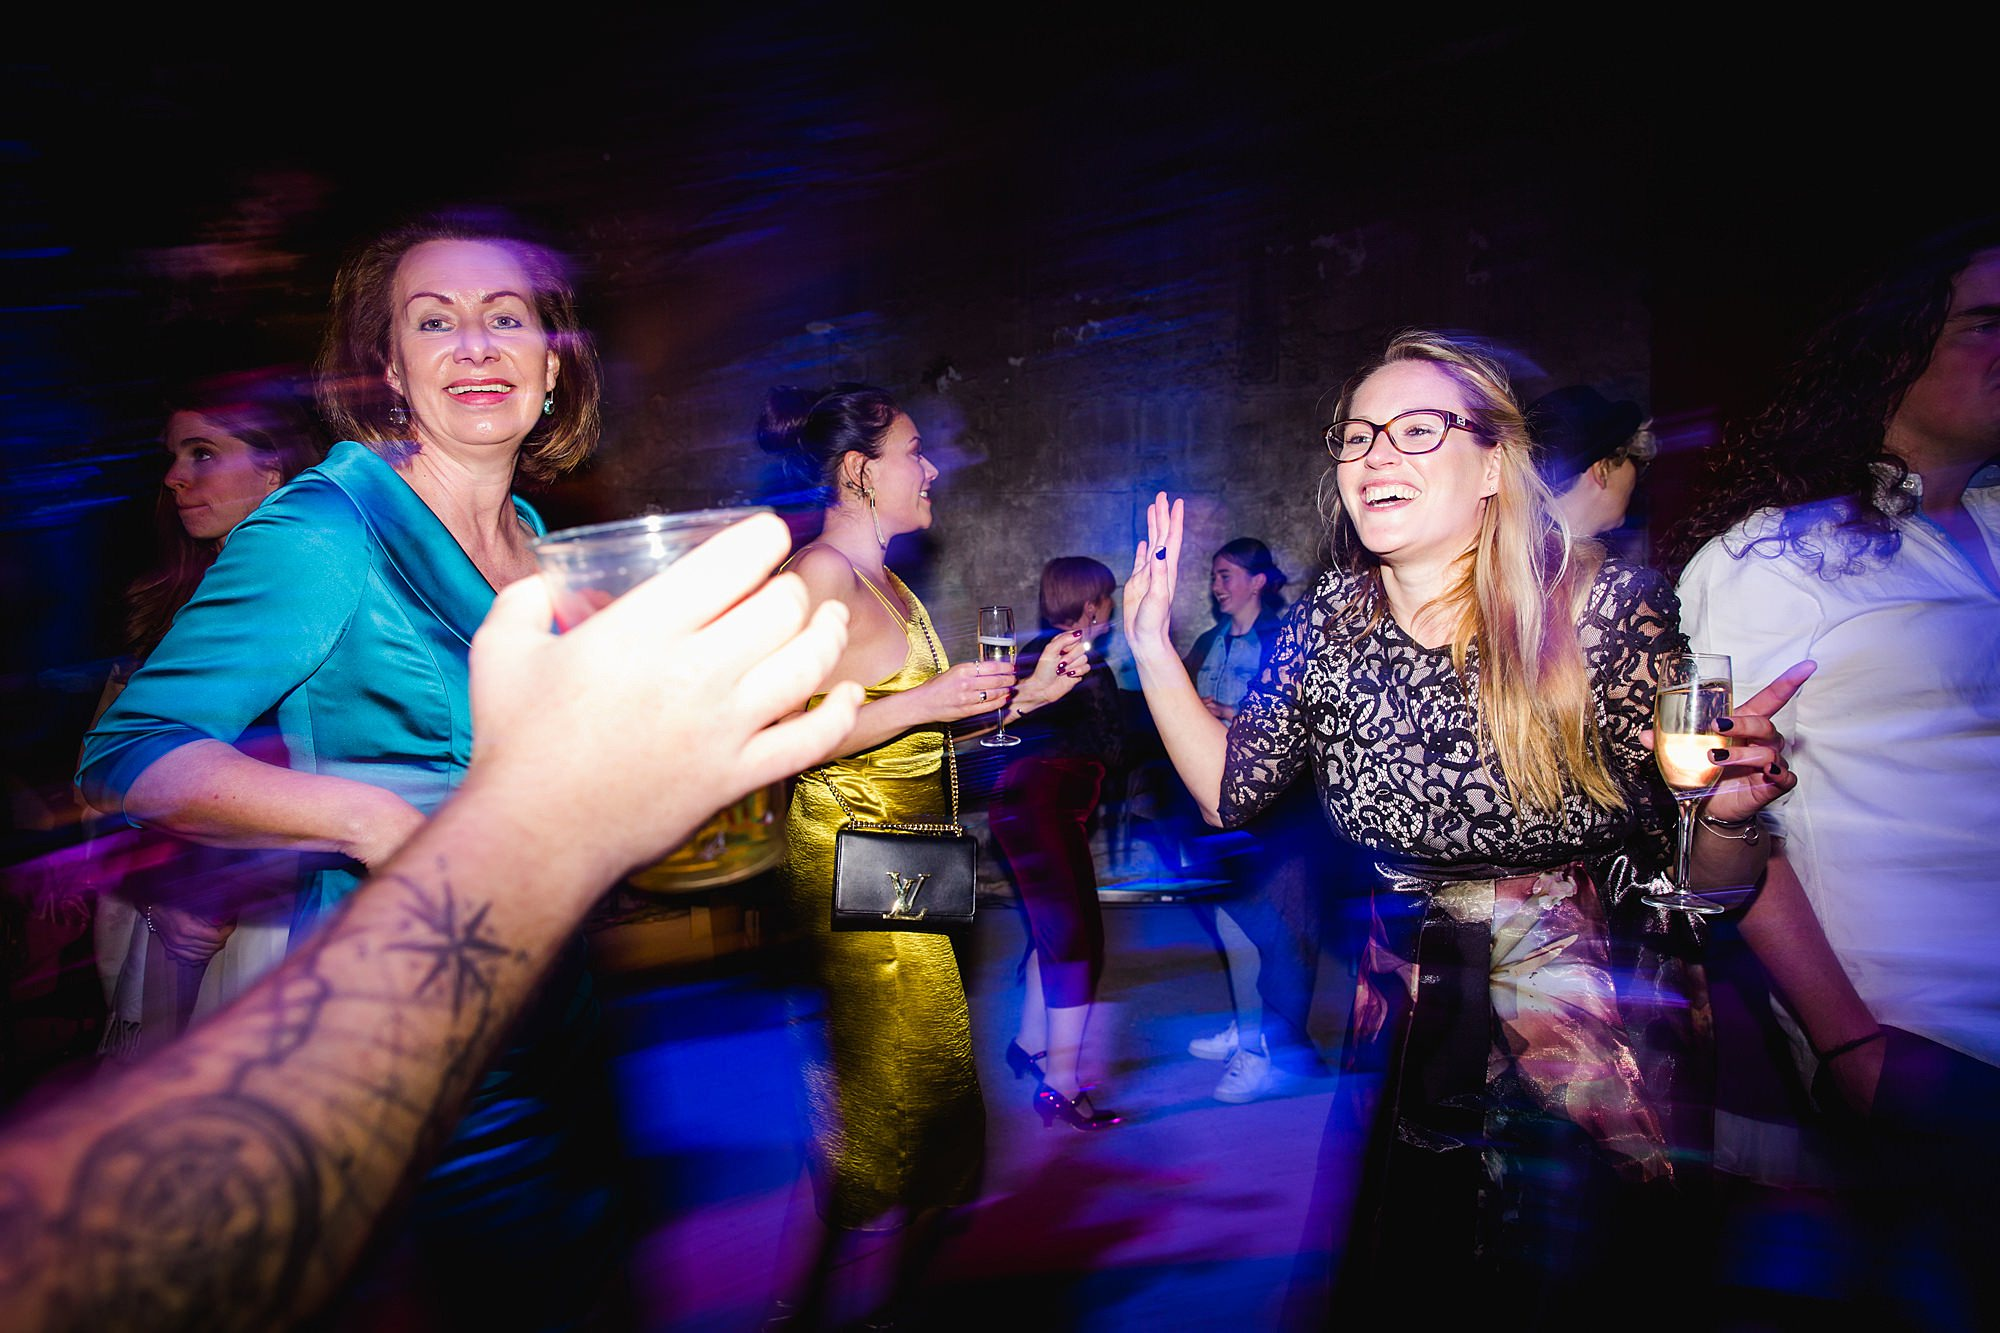 Brunel museum wedding guests dance together